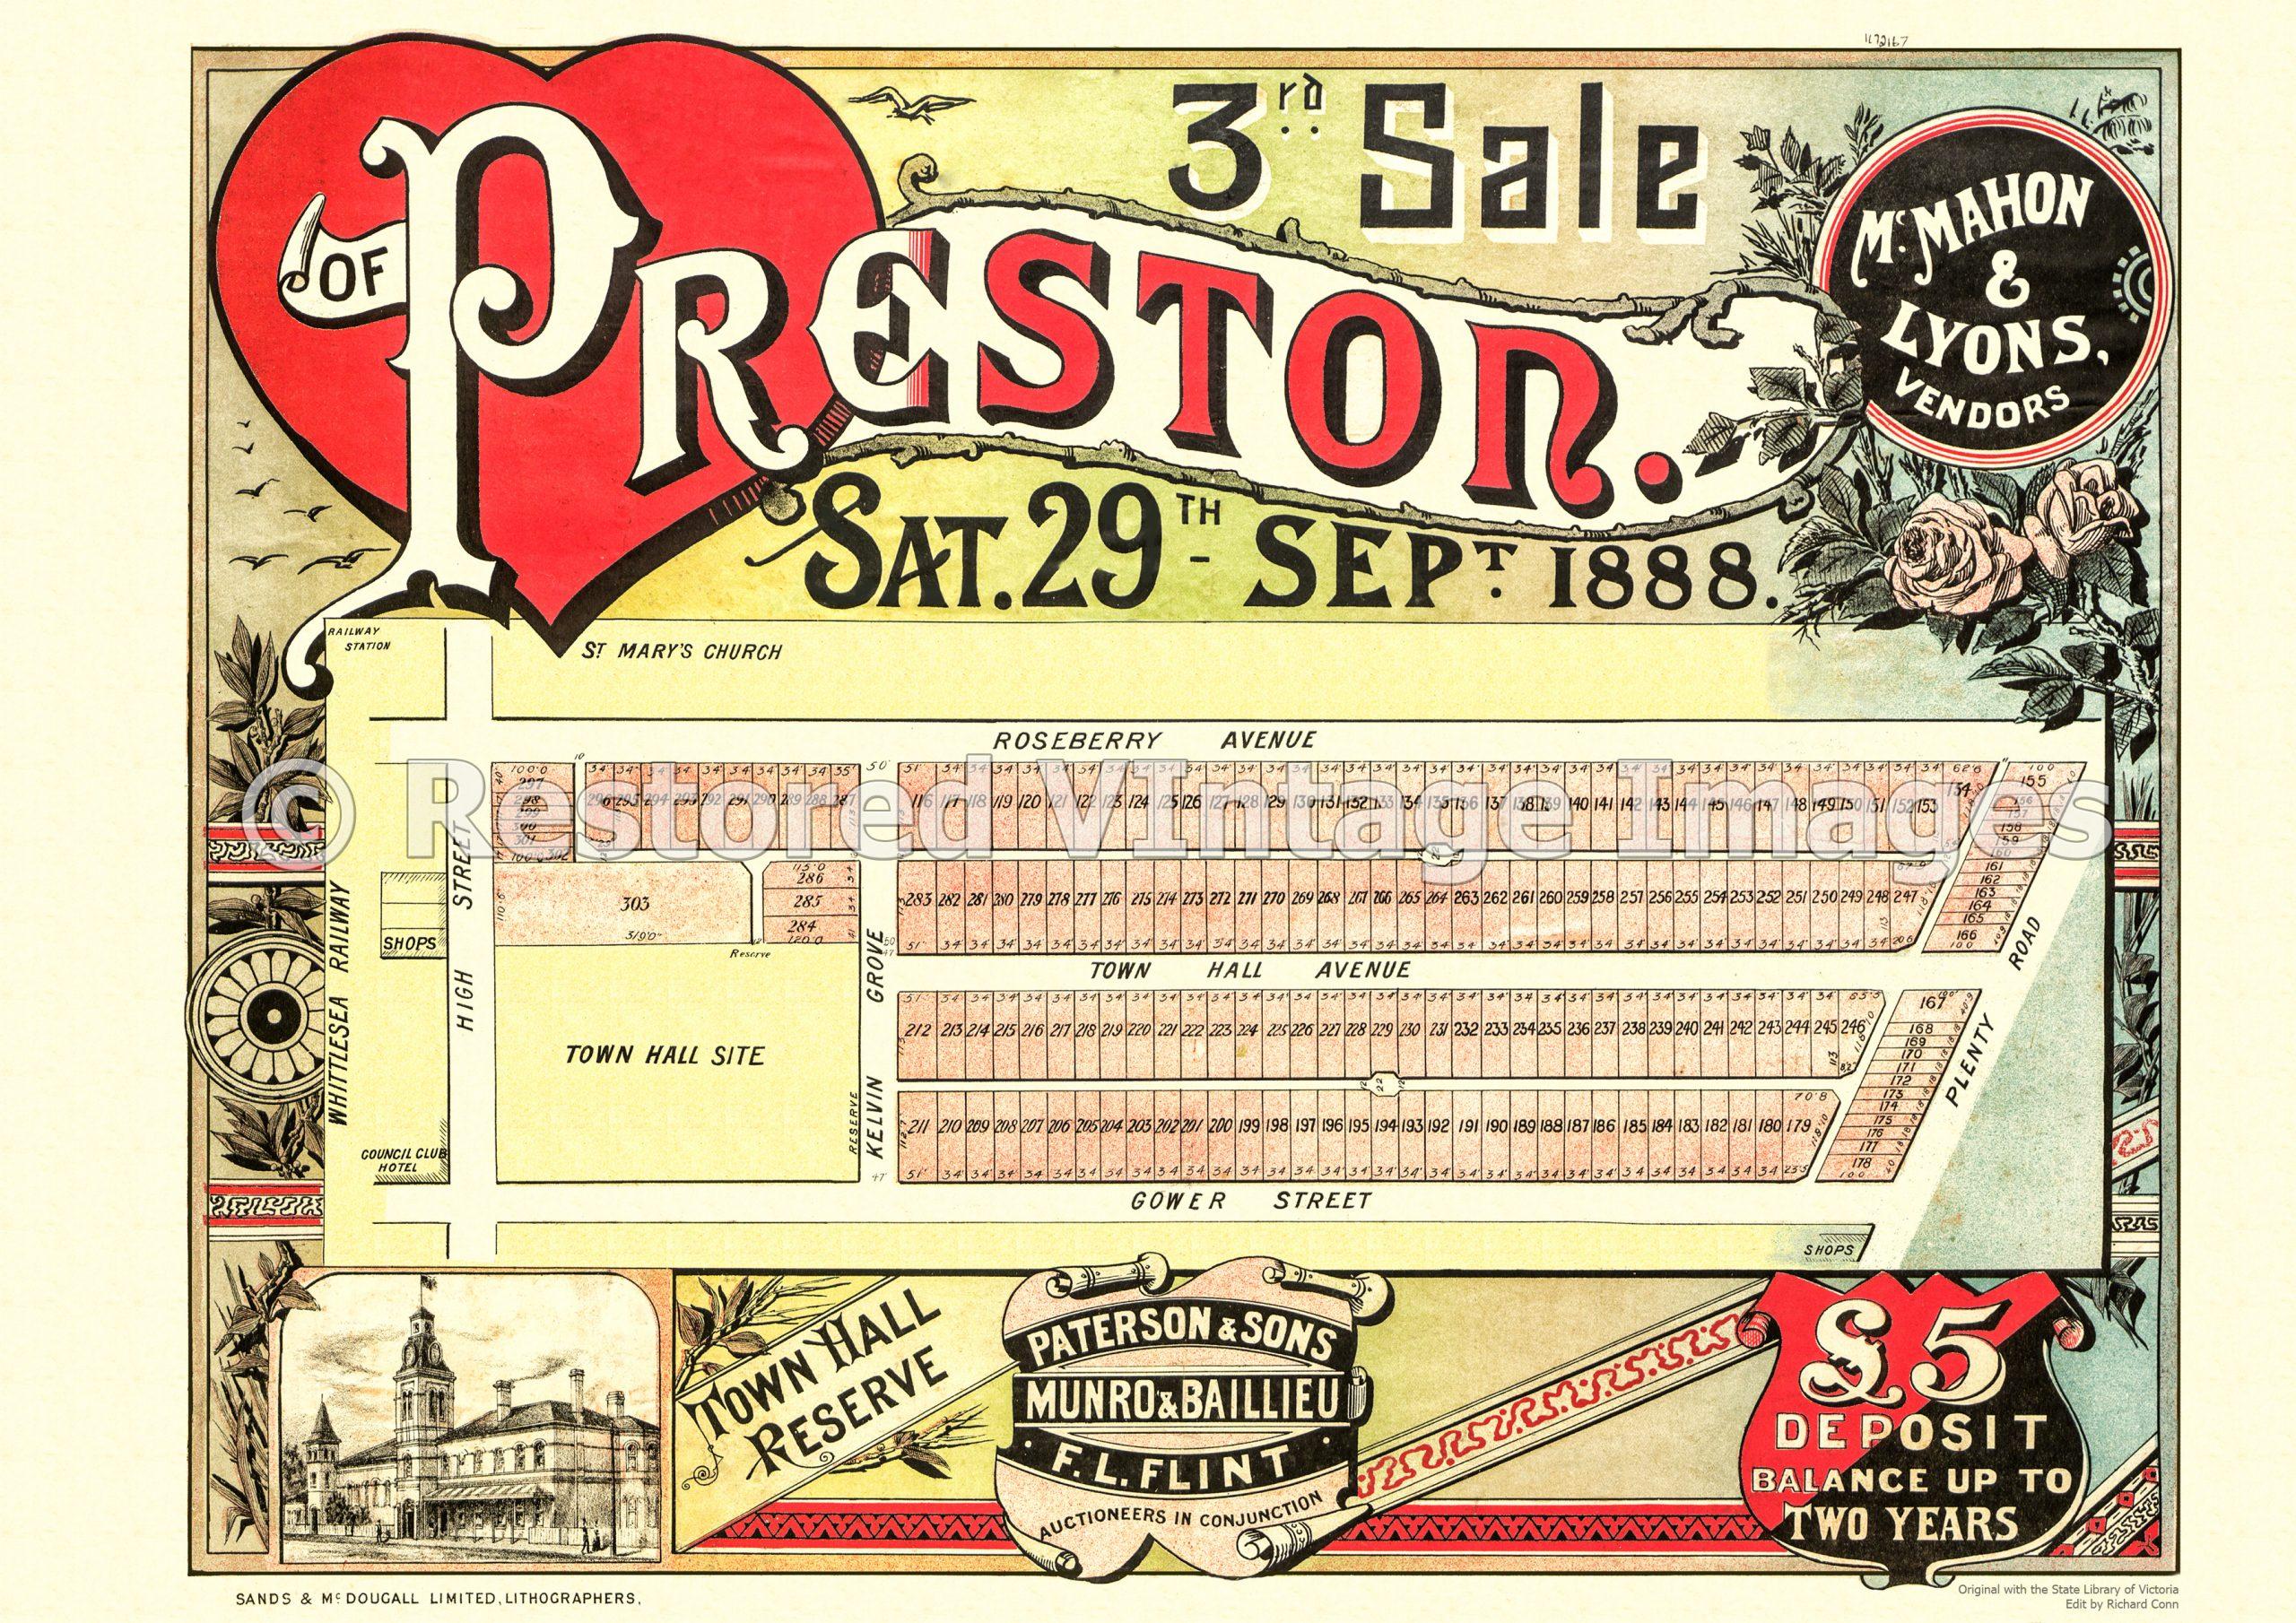 Heart Of Preston 3rd Sale 29th September 1888 – Preston